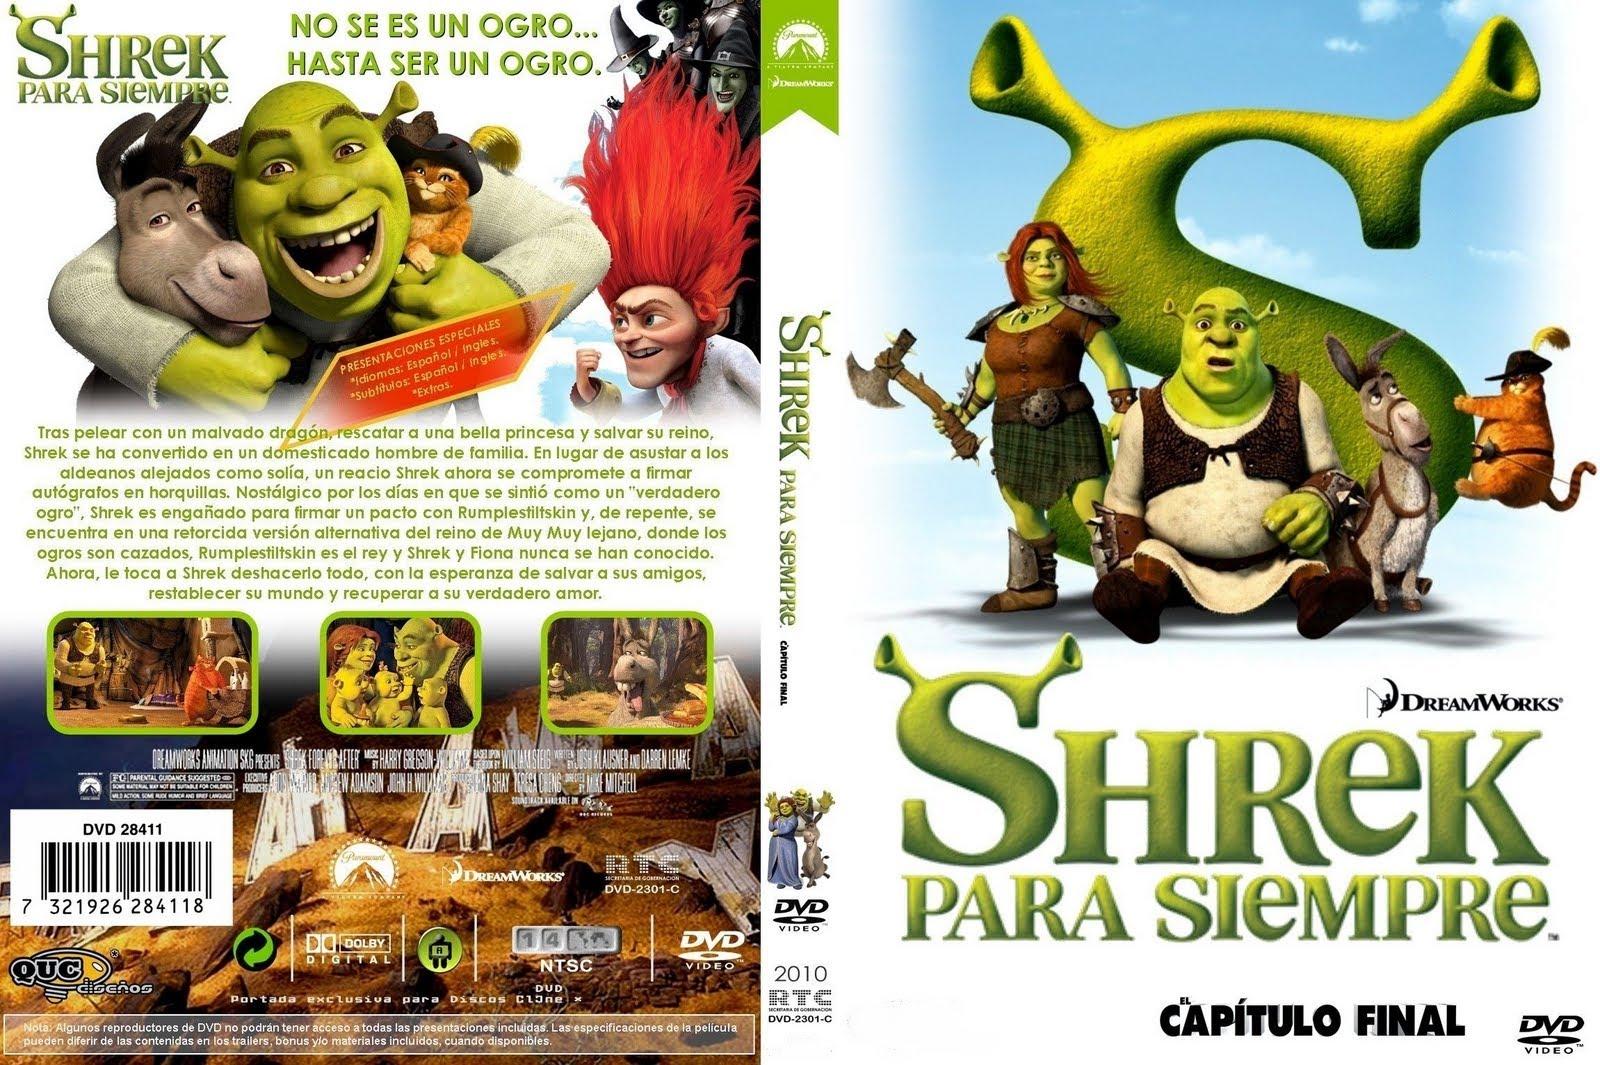 Shrek por hentai scene